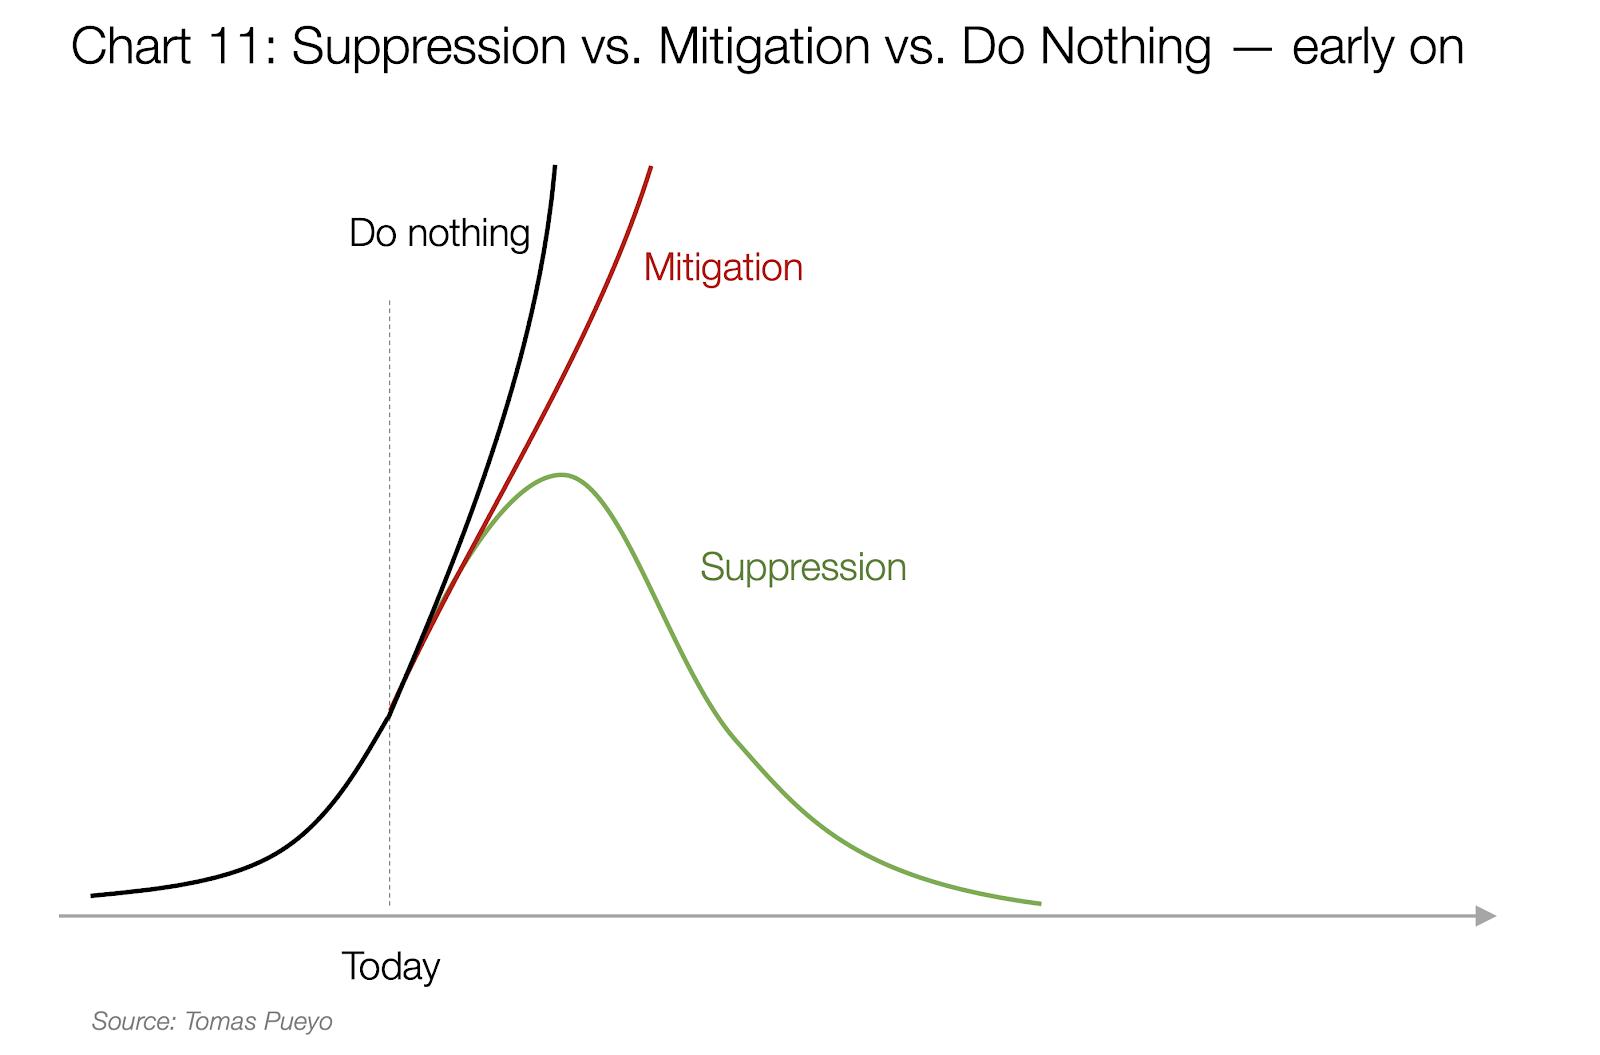 suppression vs. migration vs. do nothing chart